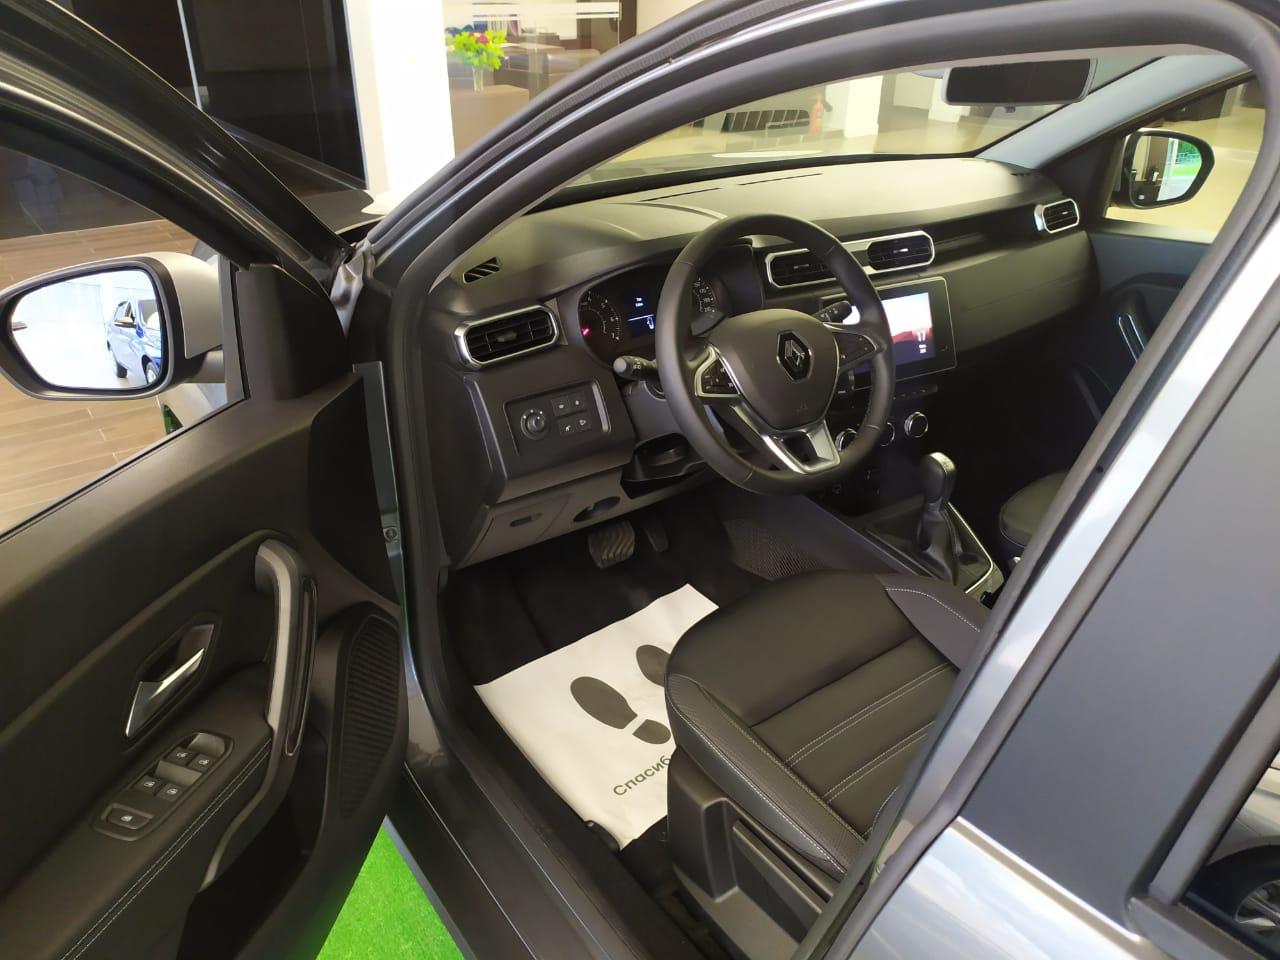 НОВЫЙ RENAULT DUSTER TCe 150 4×4 CVT X-Tronic, Style, Темно-серый металлик Dark Grey, 2021